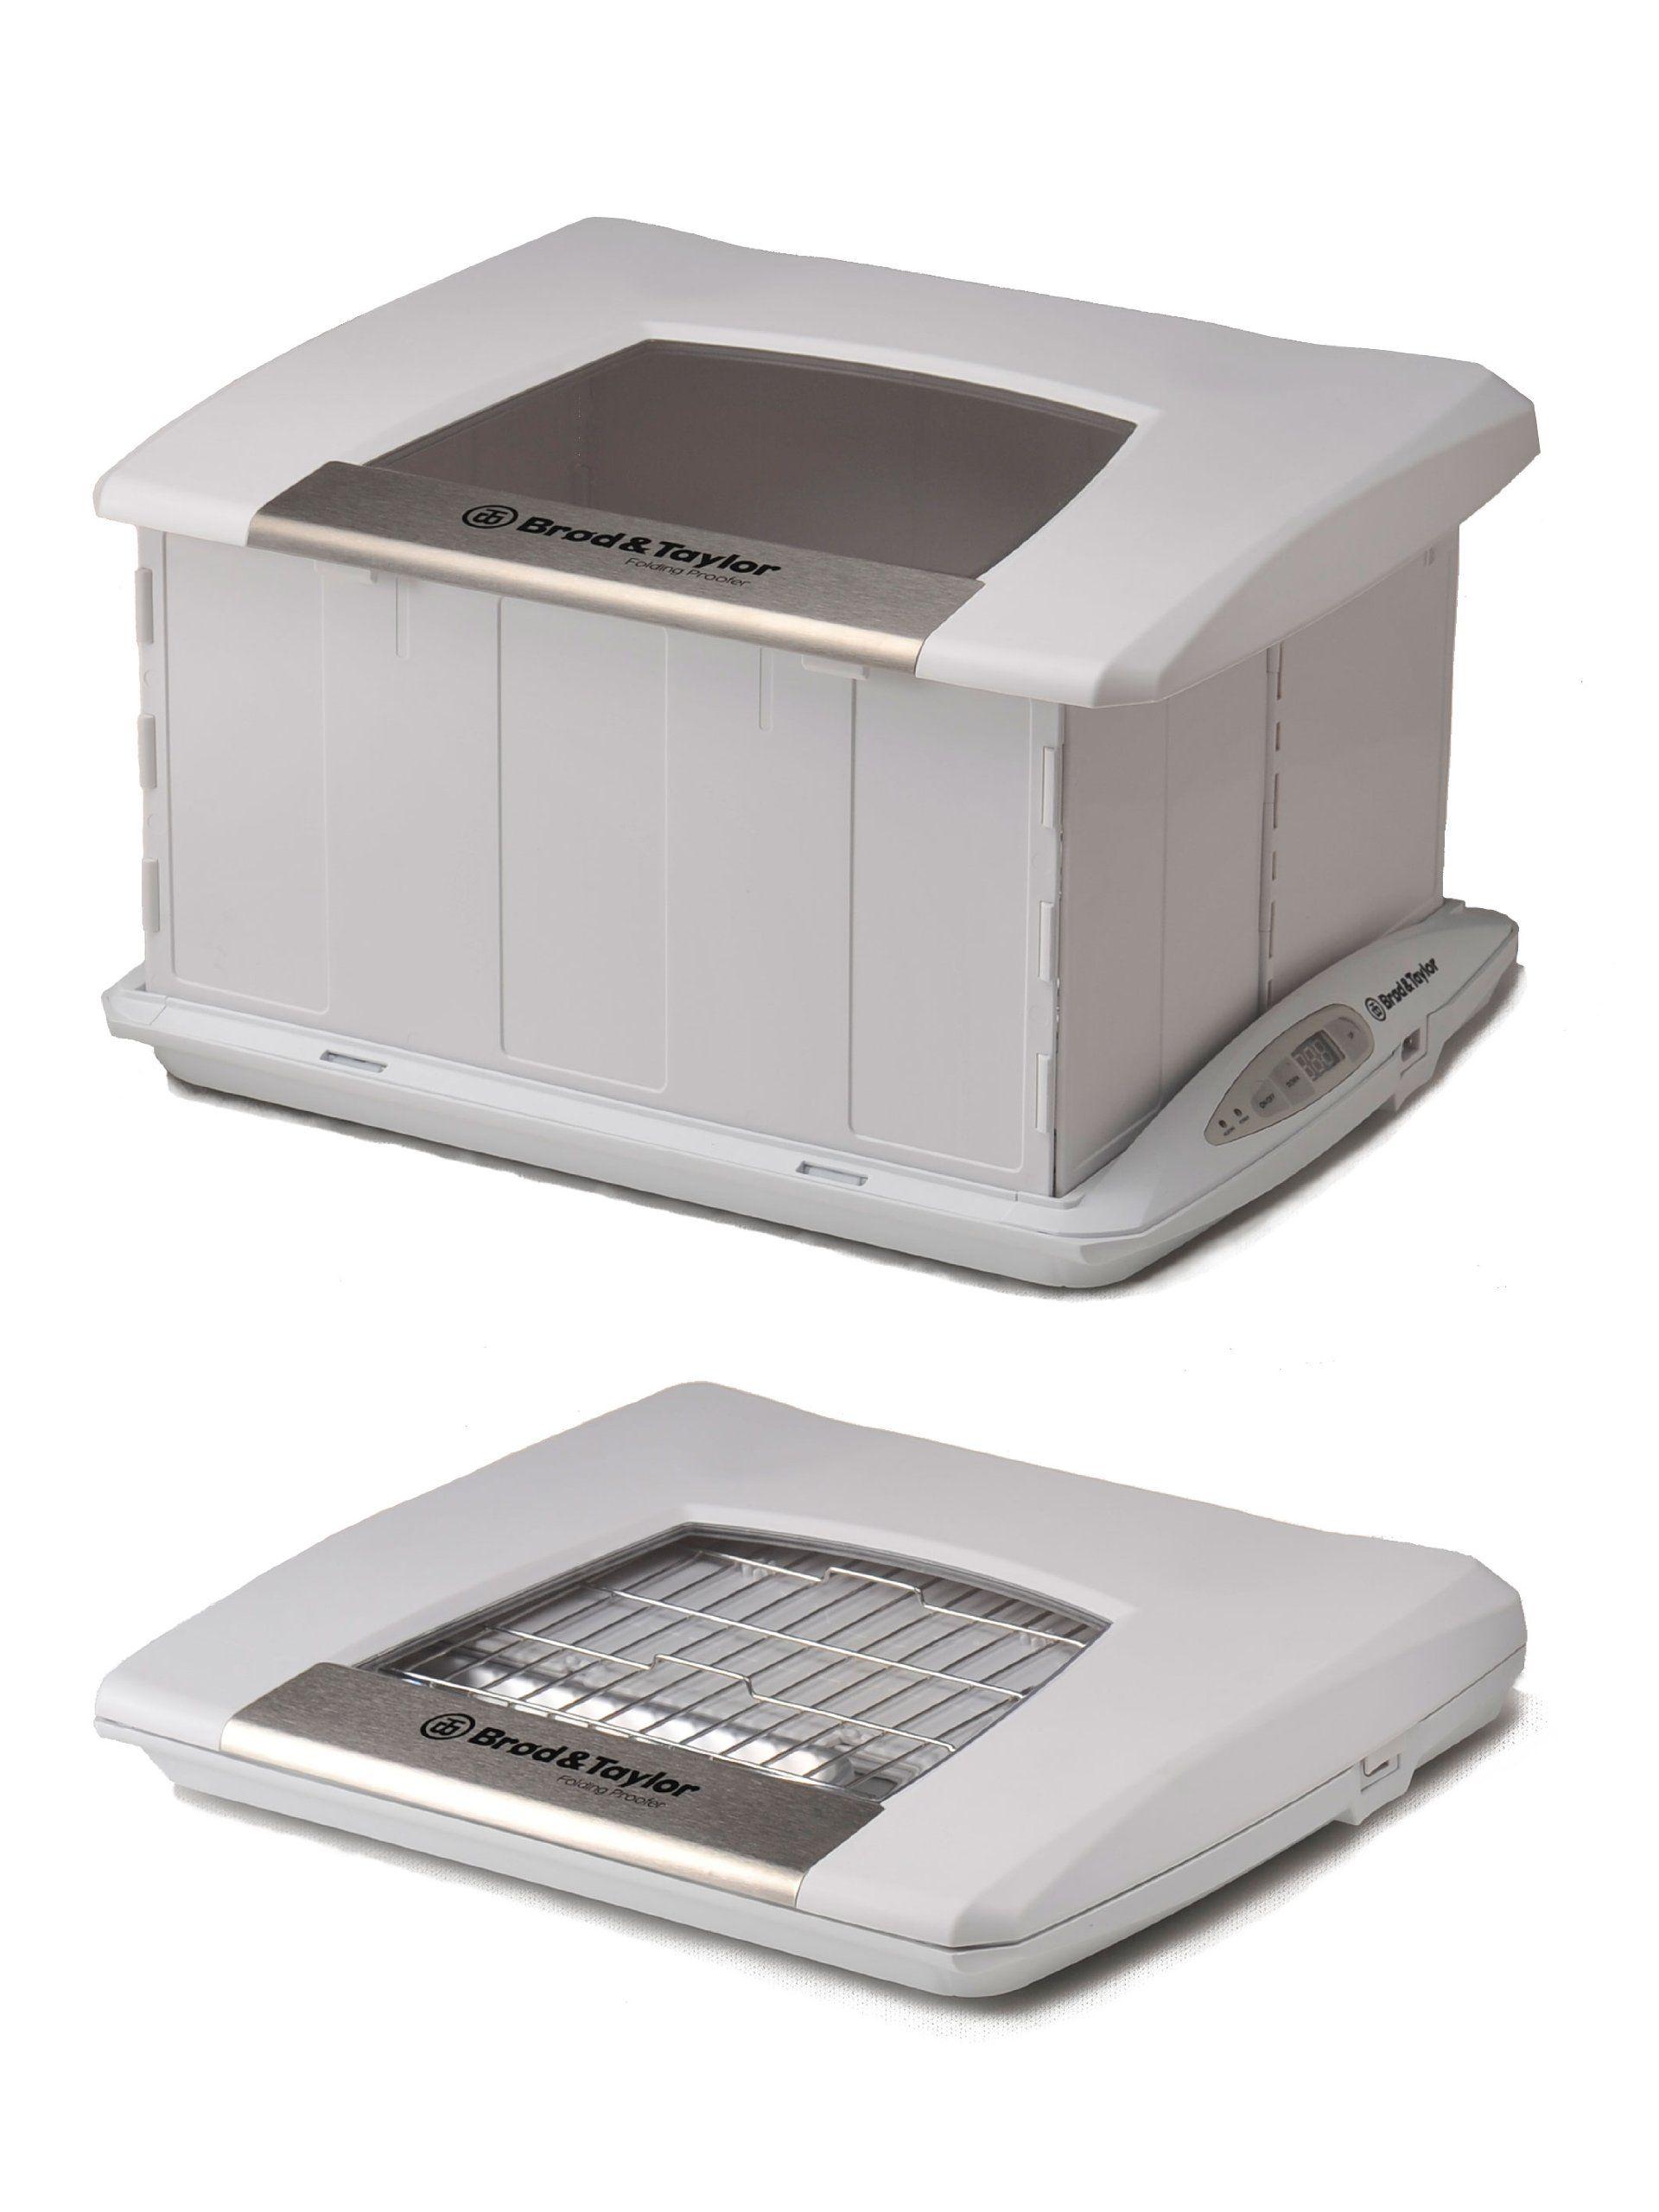 Amazon Com Folding Bread Proofer And Yogurt Maker Bread Machines Kitchen Dining Bread Proofer Yogurt Maker